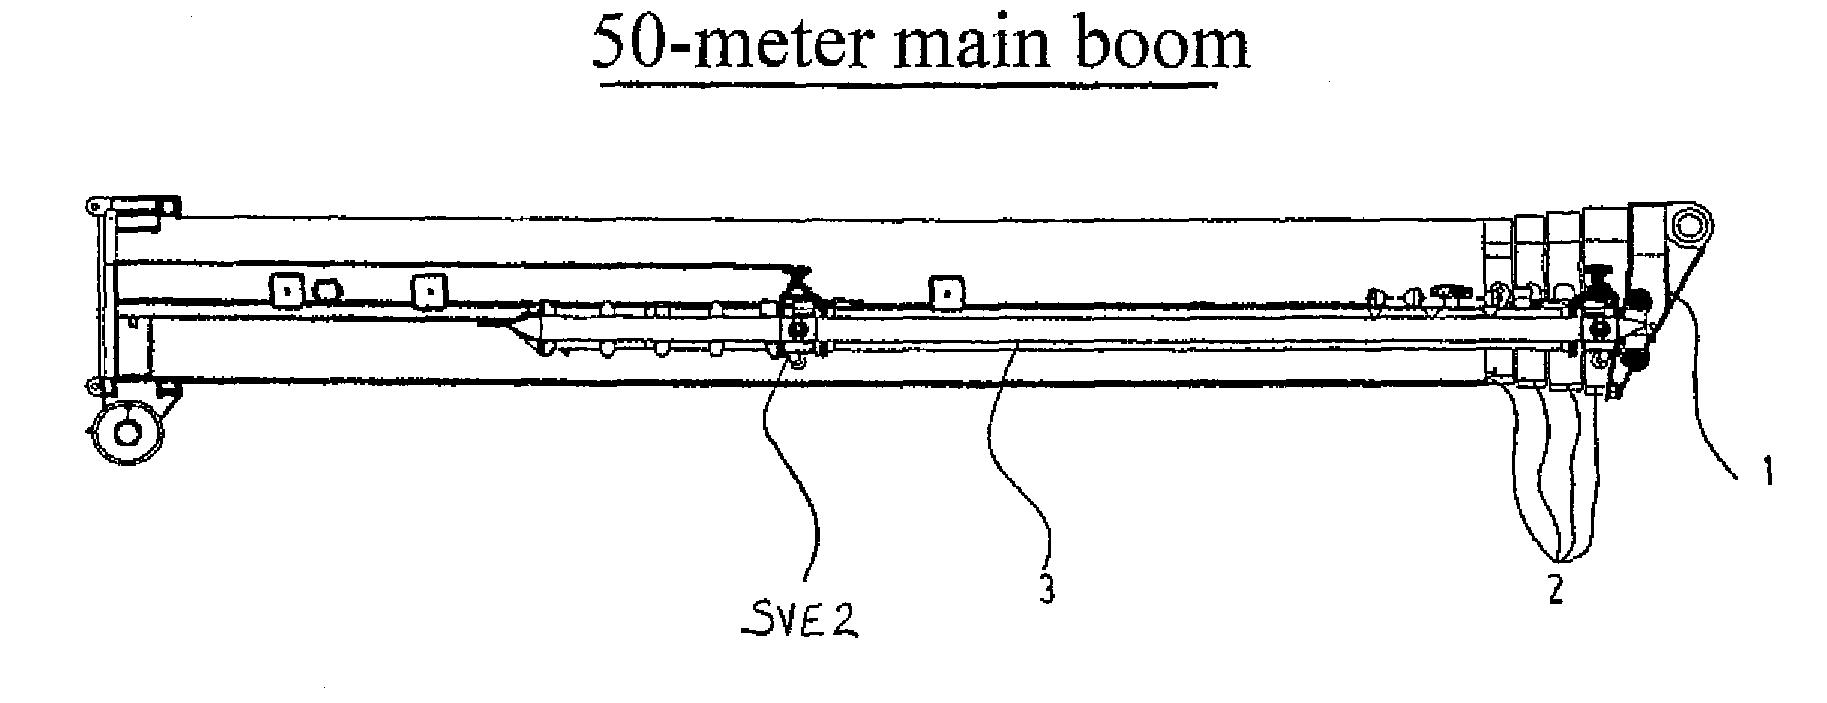 Telescopic Crane Components : Patent us crane with telescopic boom google patents